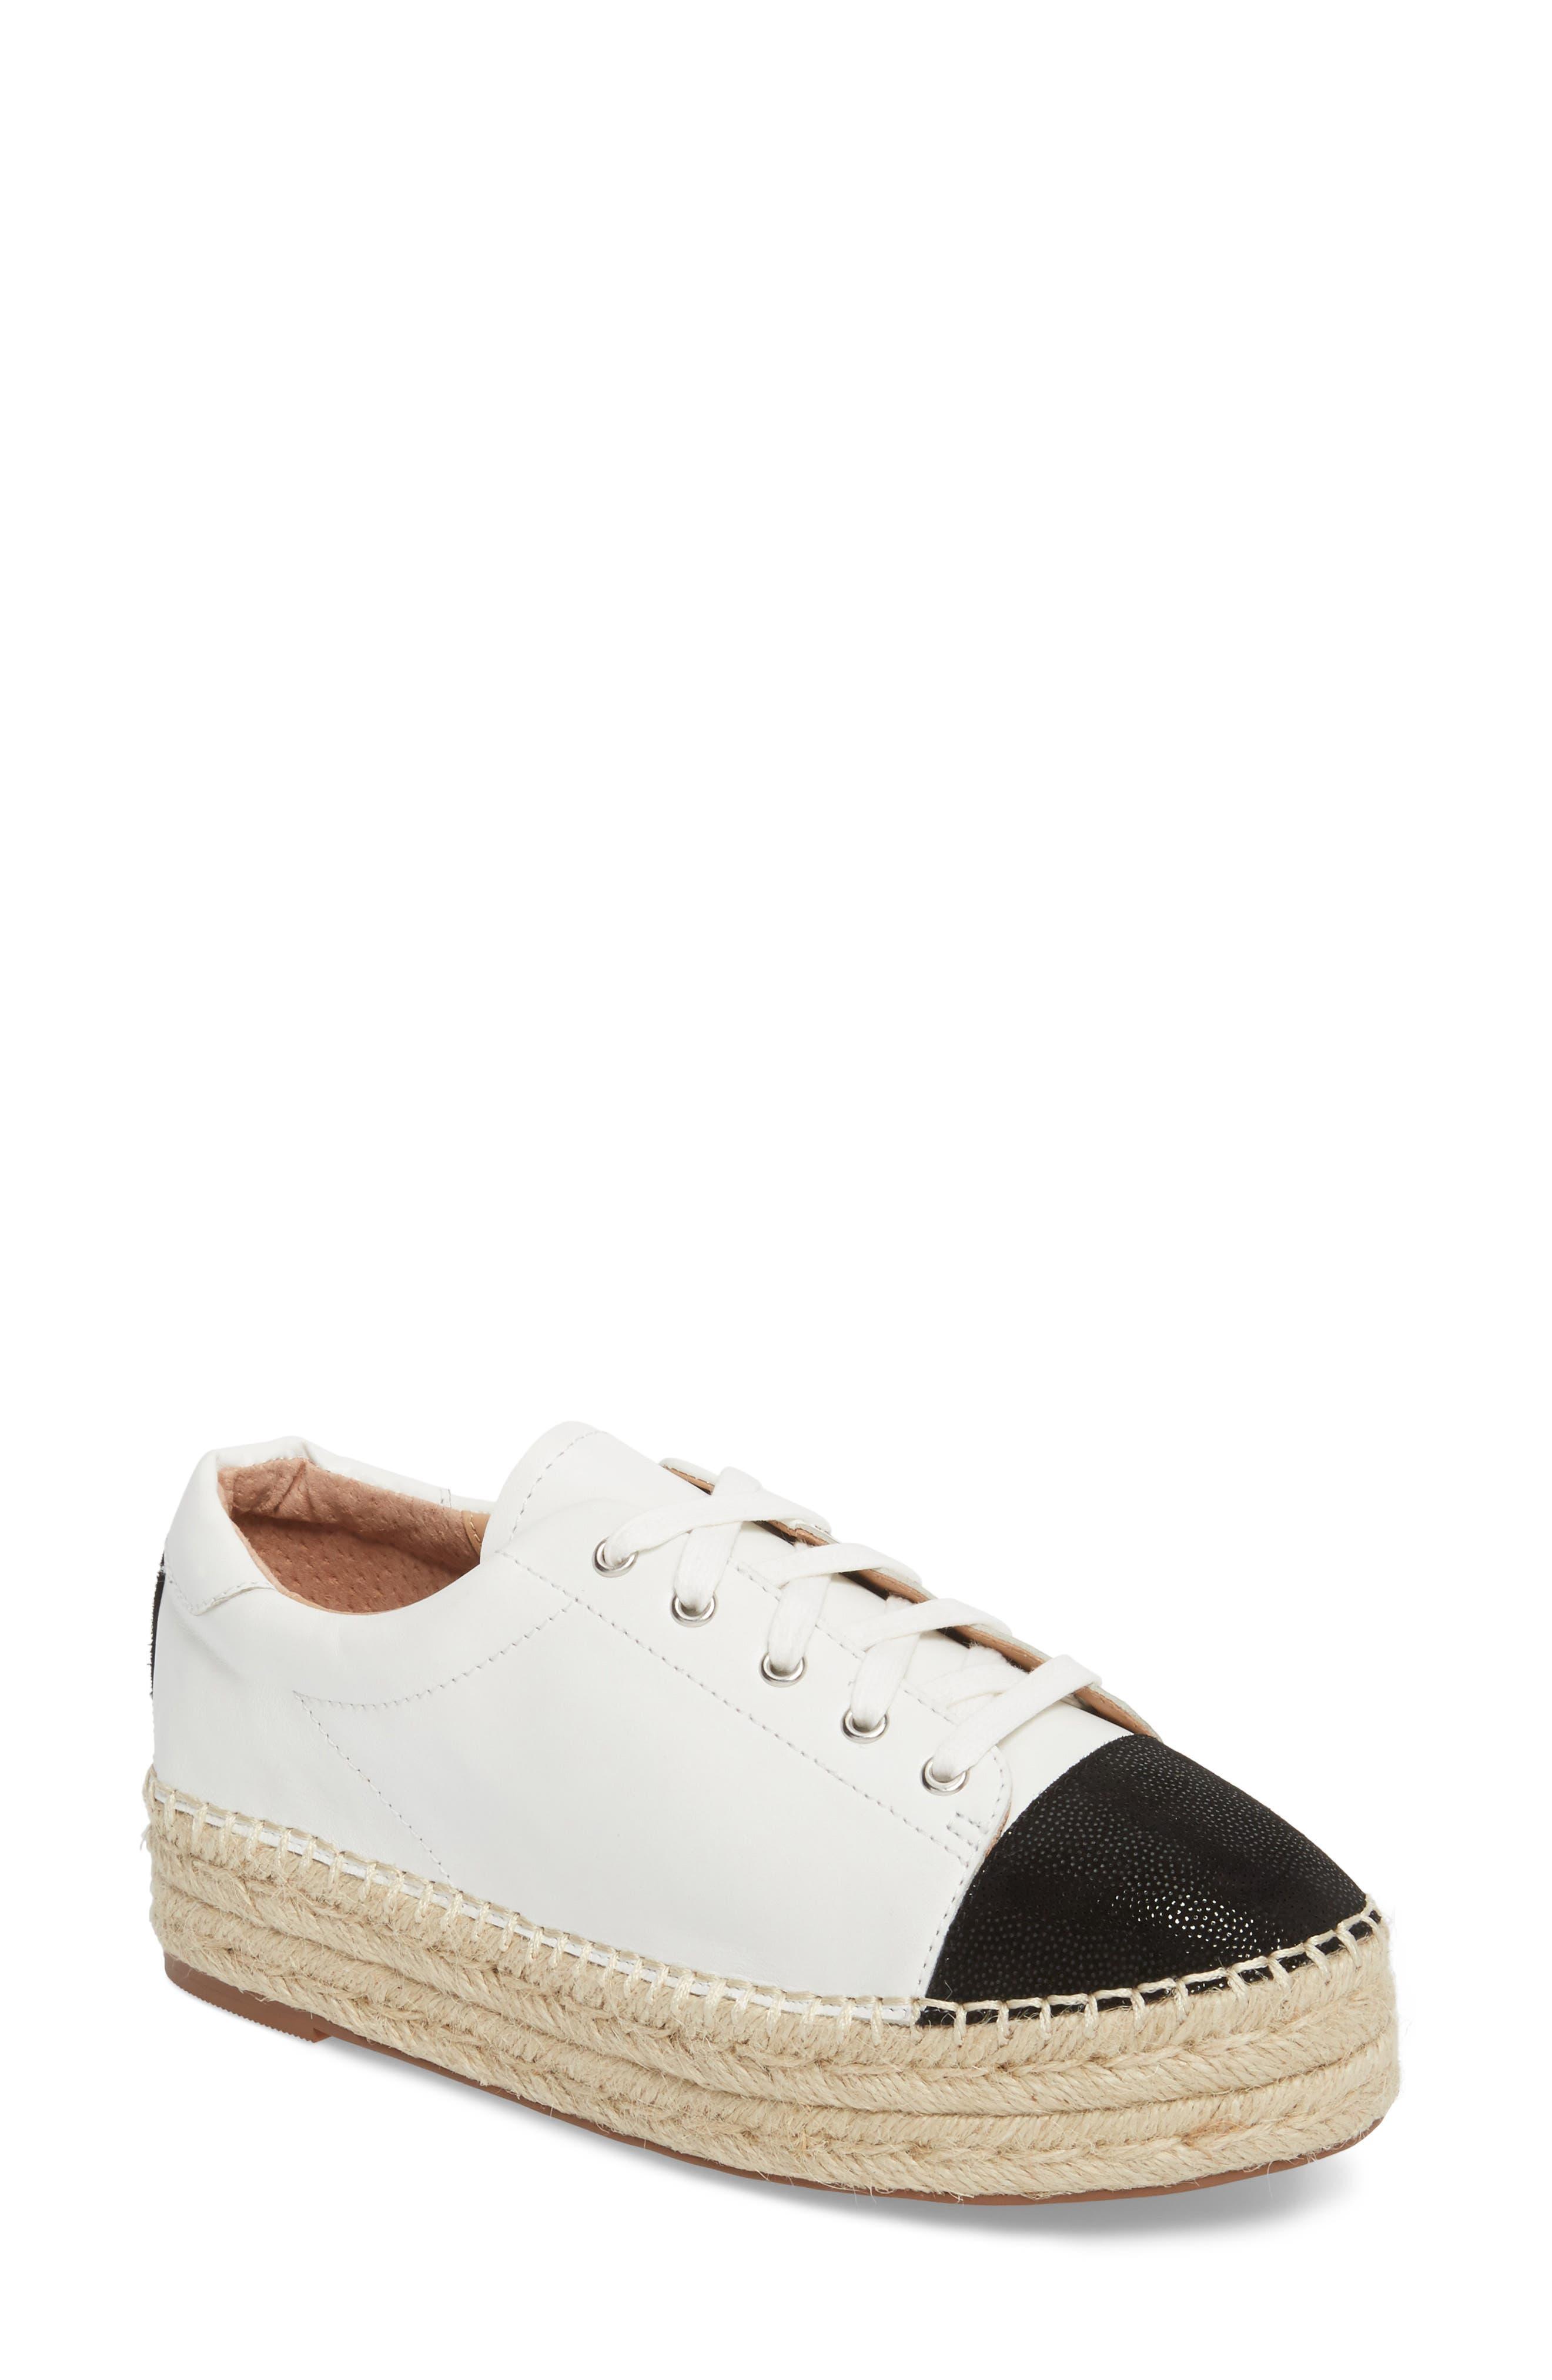 Sierra Espadrille Platform Sneaker,                         Main,                         color, 108